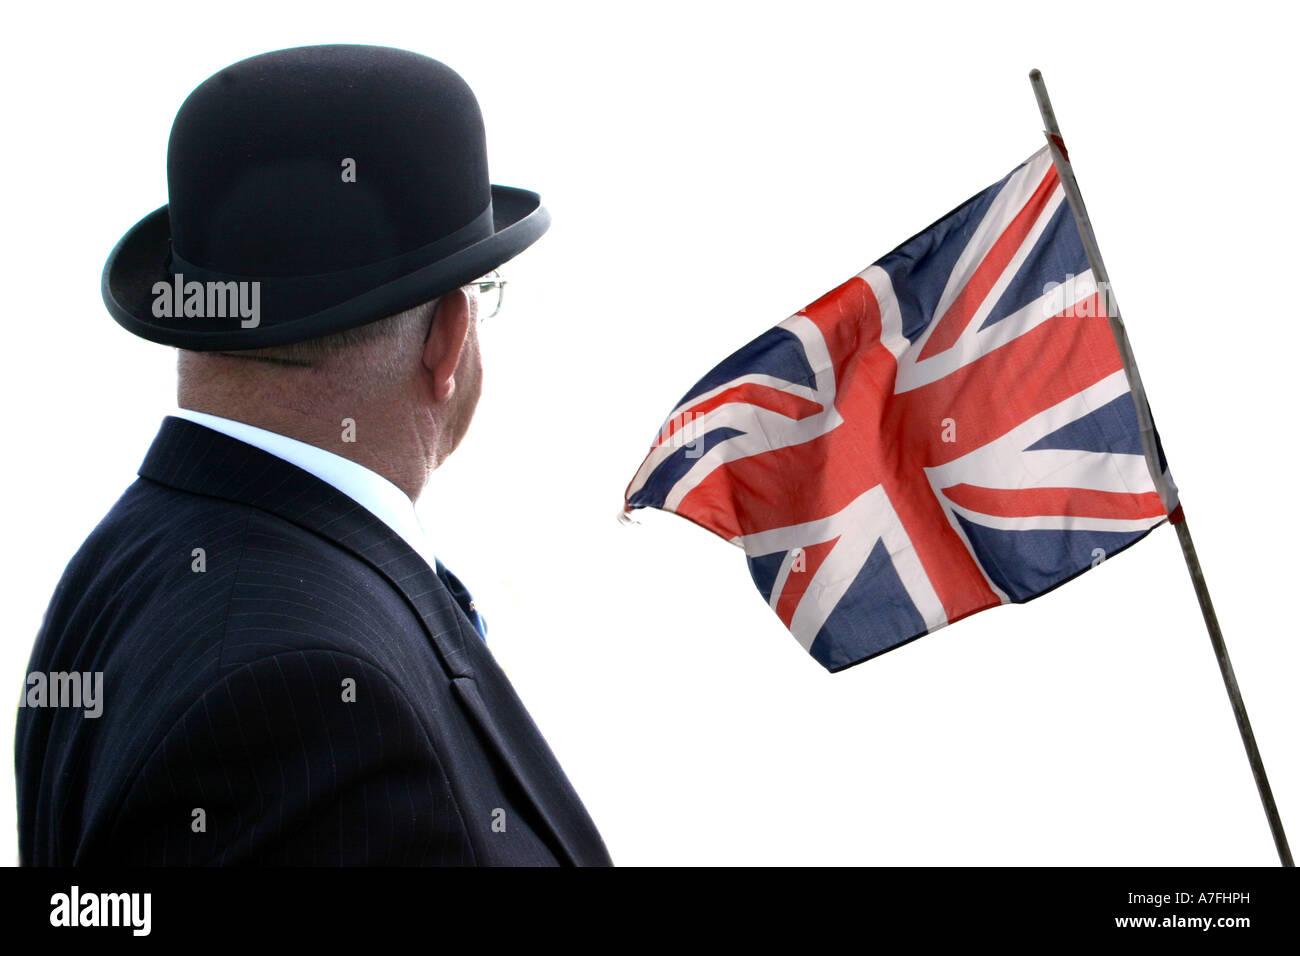 Icon British symbols of the Bowler hat and Union flag. - Stock Image